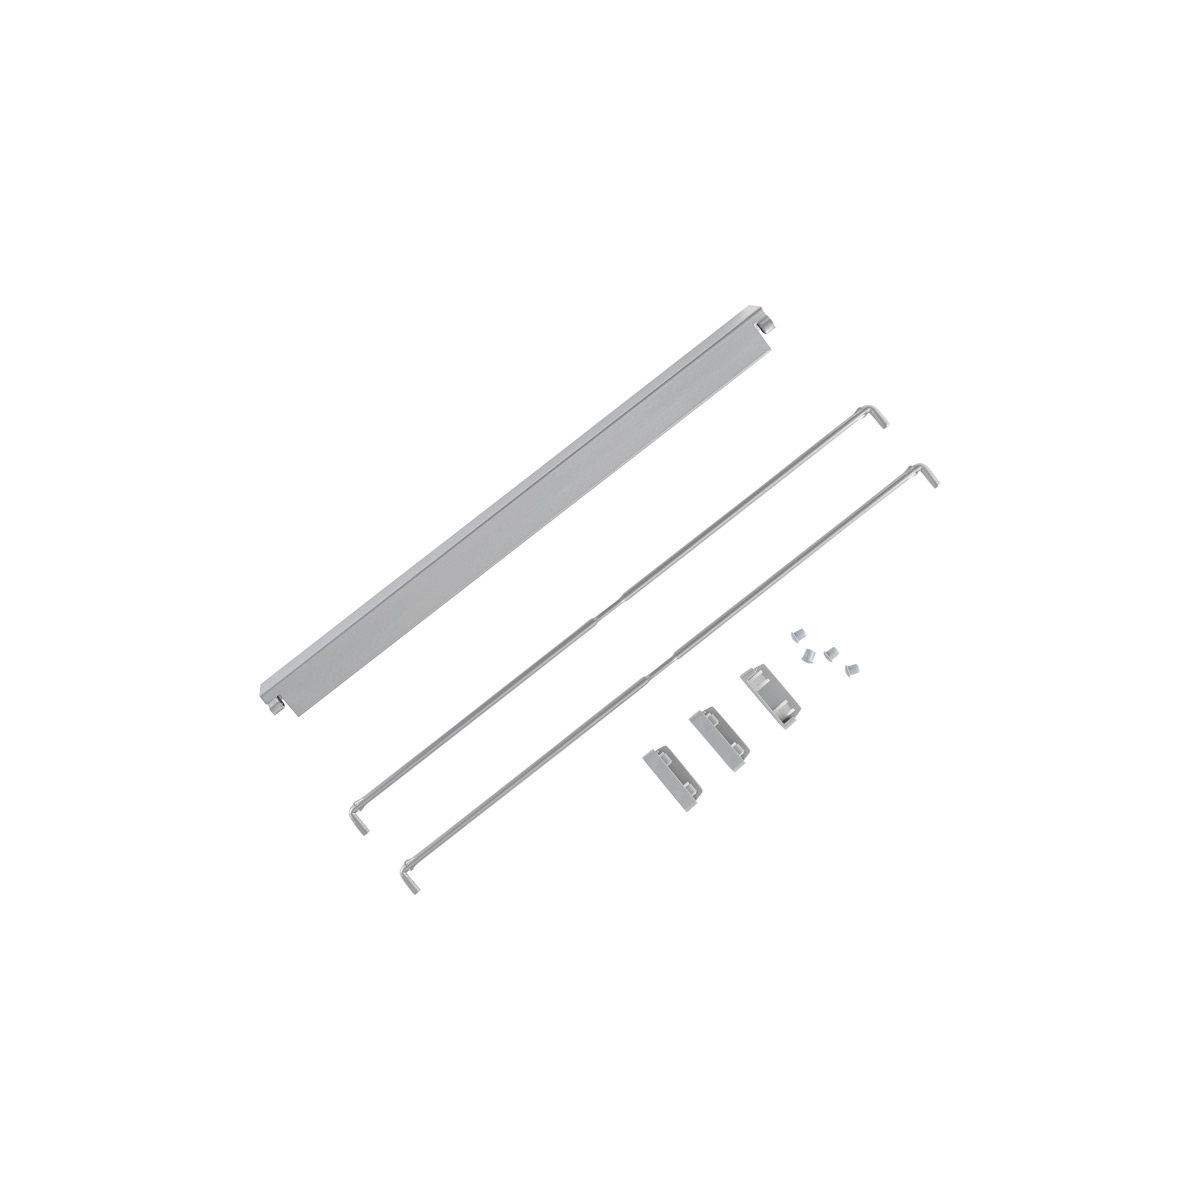 Stabilization Kit